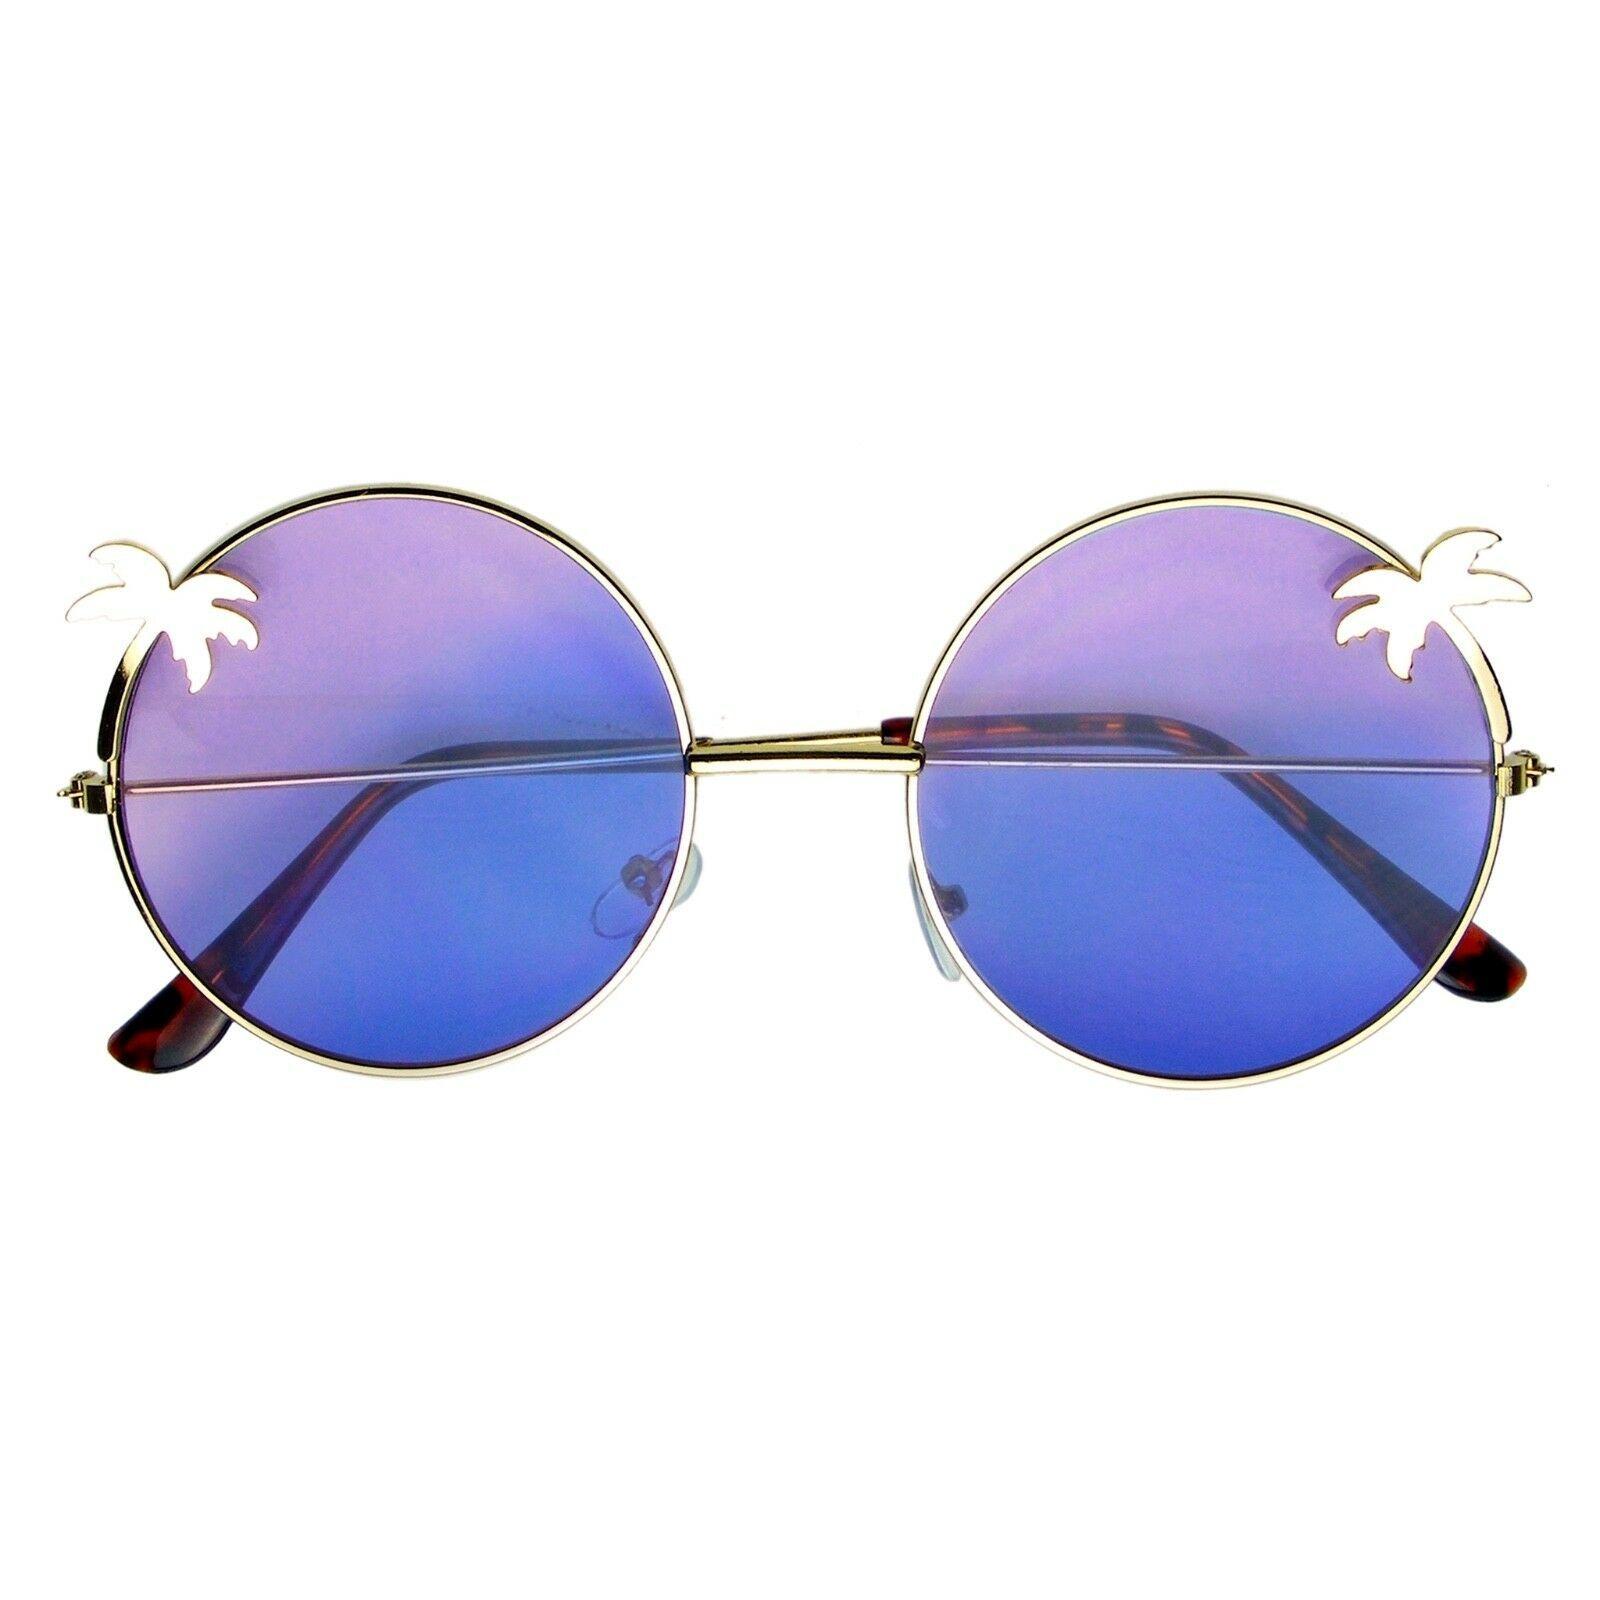 Vintage Retro Round Sun Glasses Hippie Boho Sunglasses